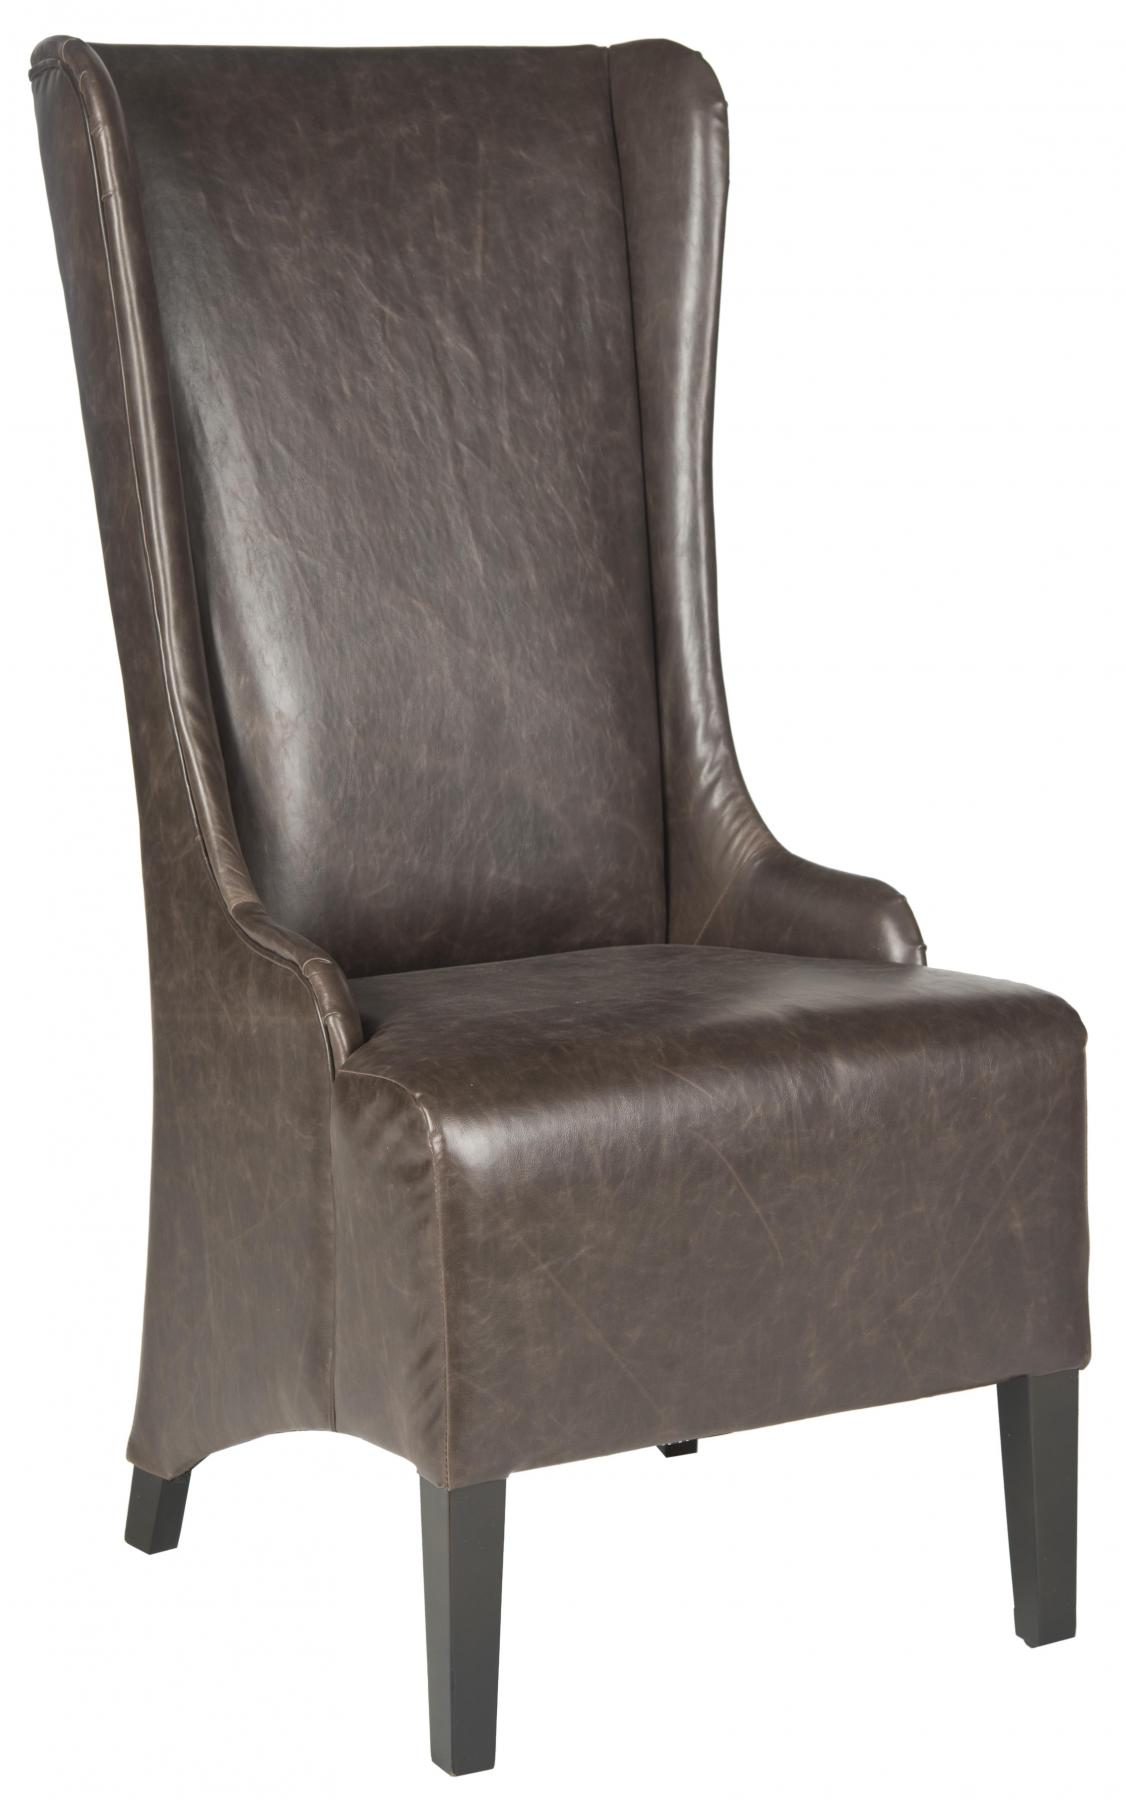 safavieh dining chairs beach chair carrier for bike mcr4501n bacall antique brown